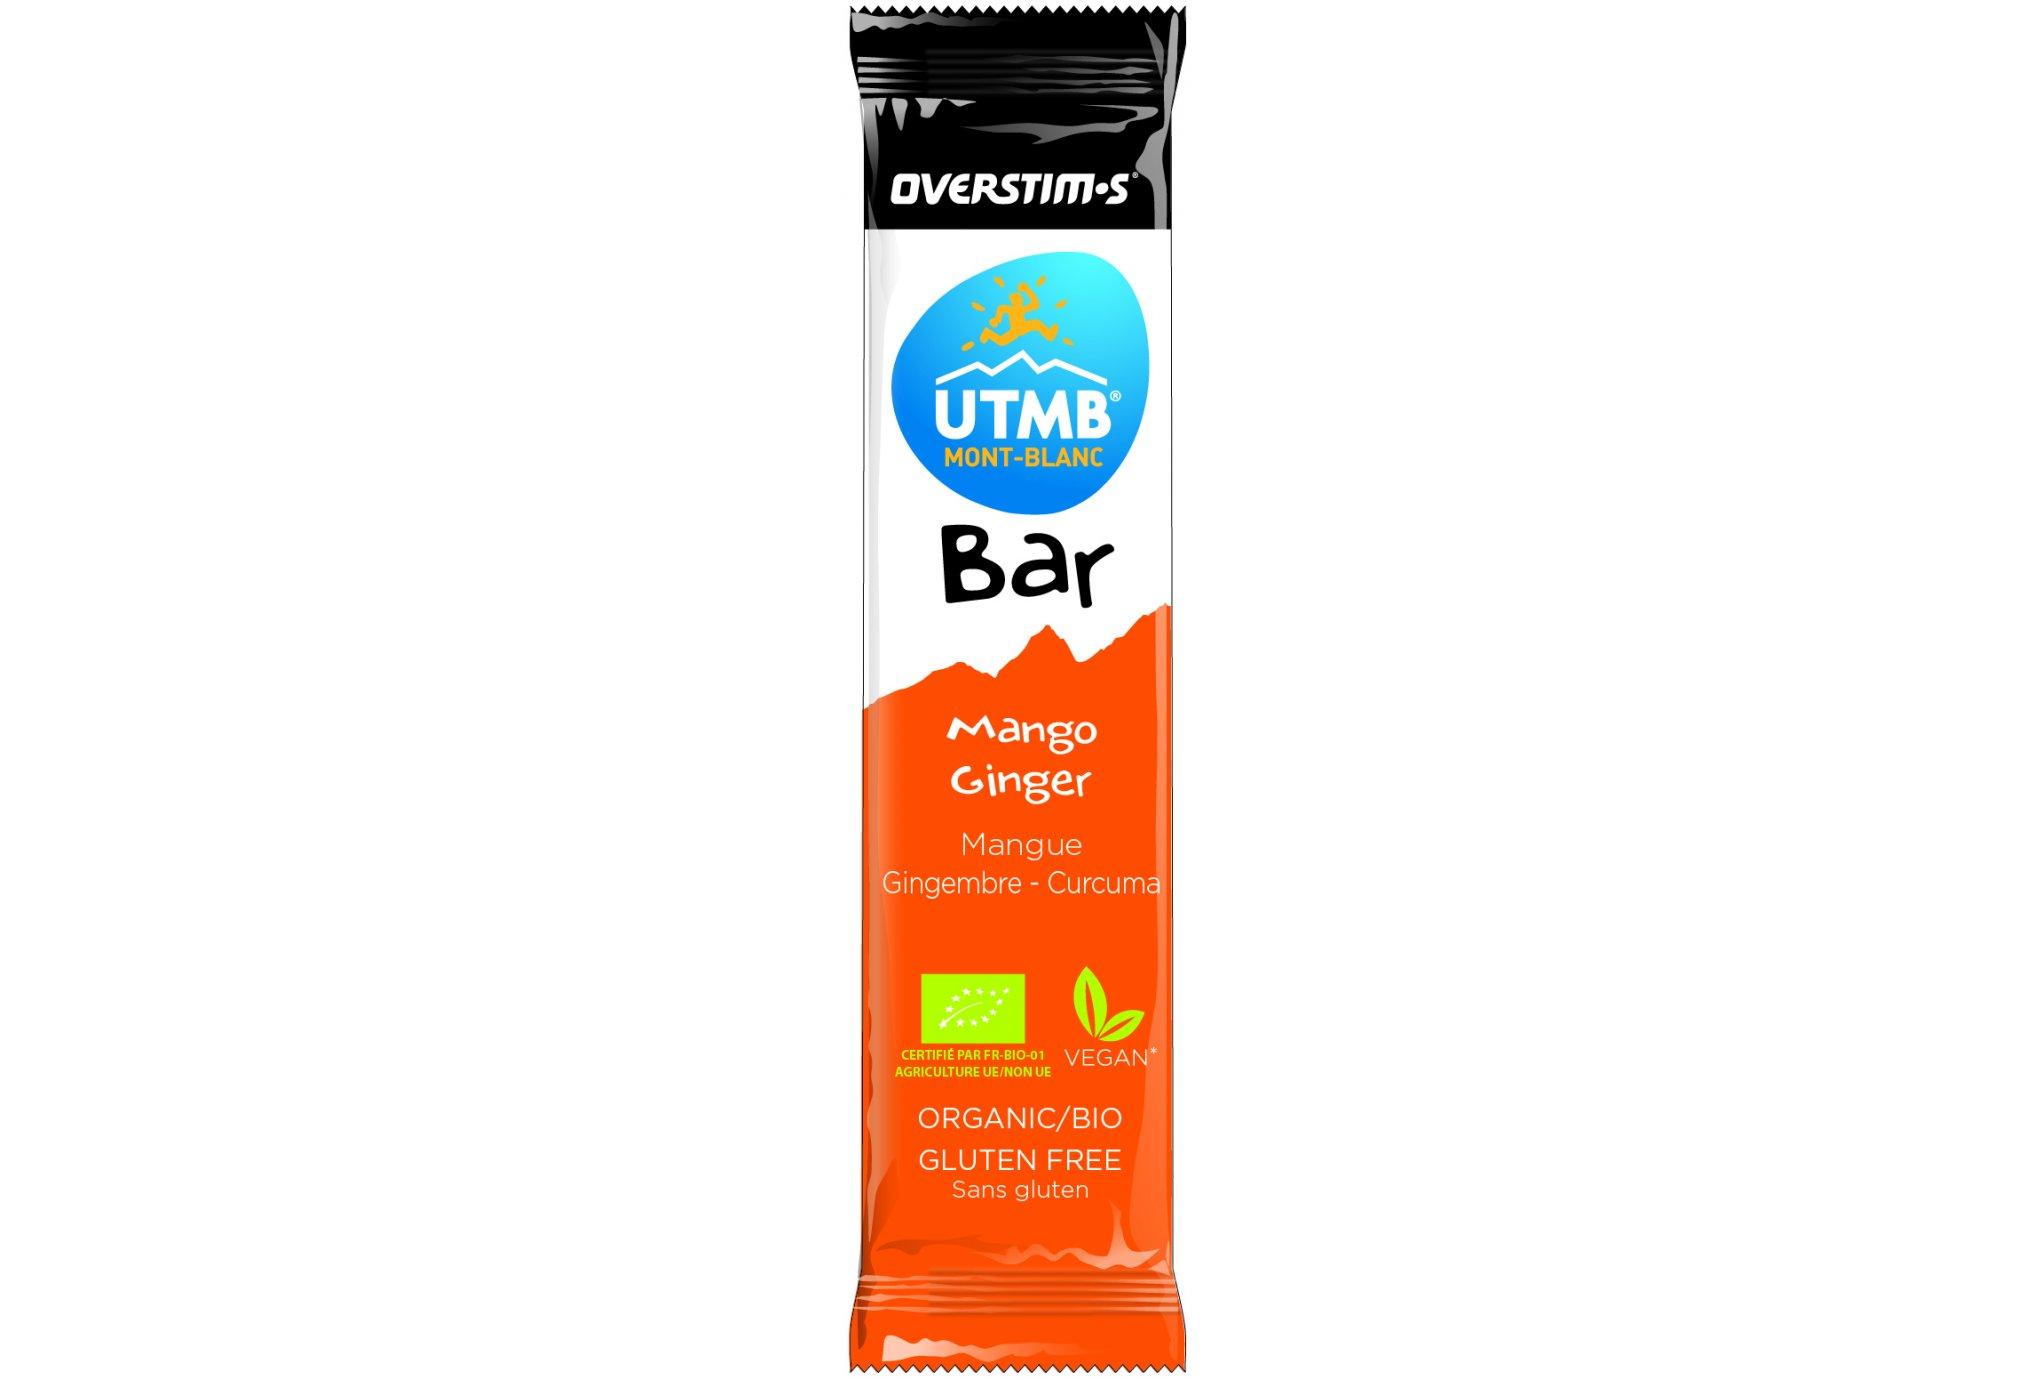 OVERSTIMS UTMB Bar - Mango/Jengibre/Cúrcuma Diététique Barres